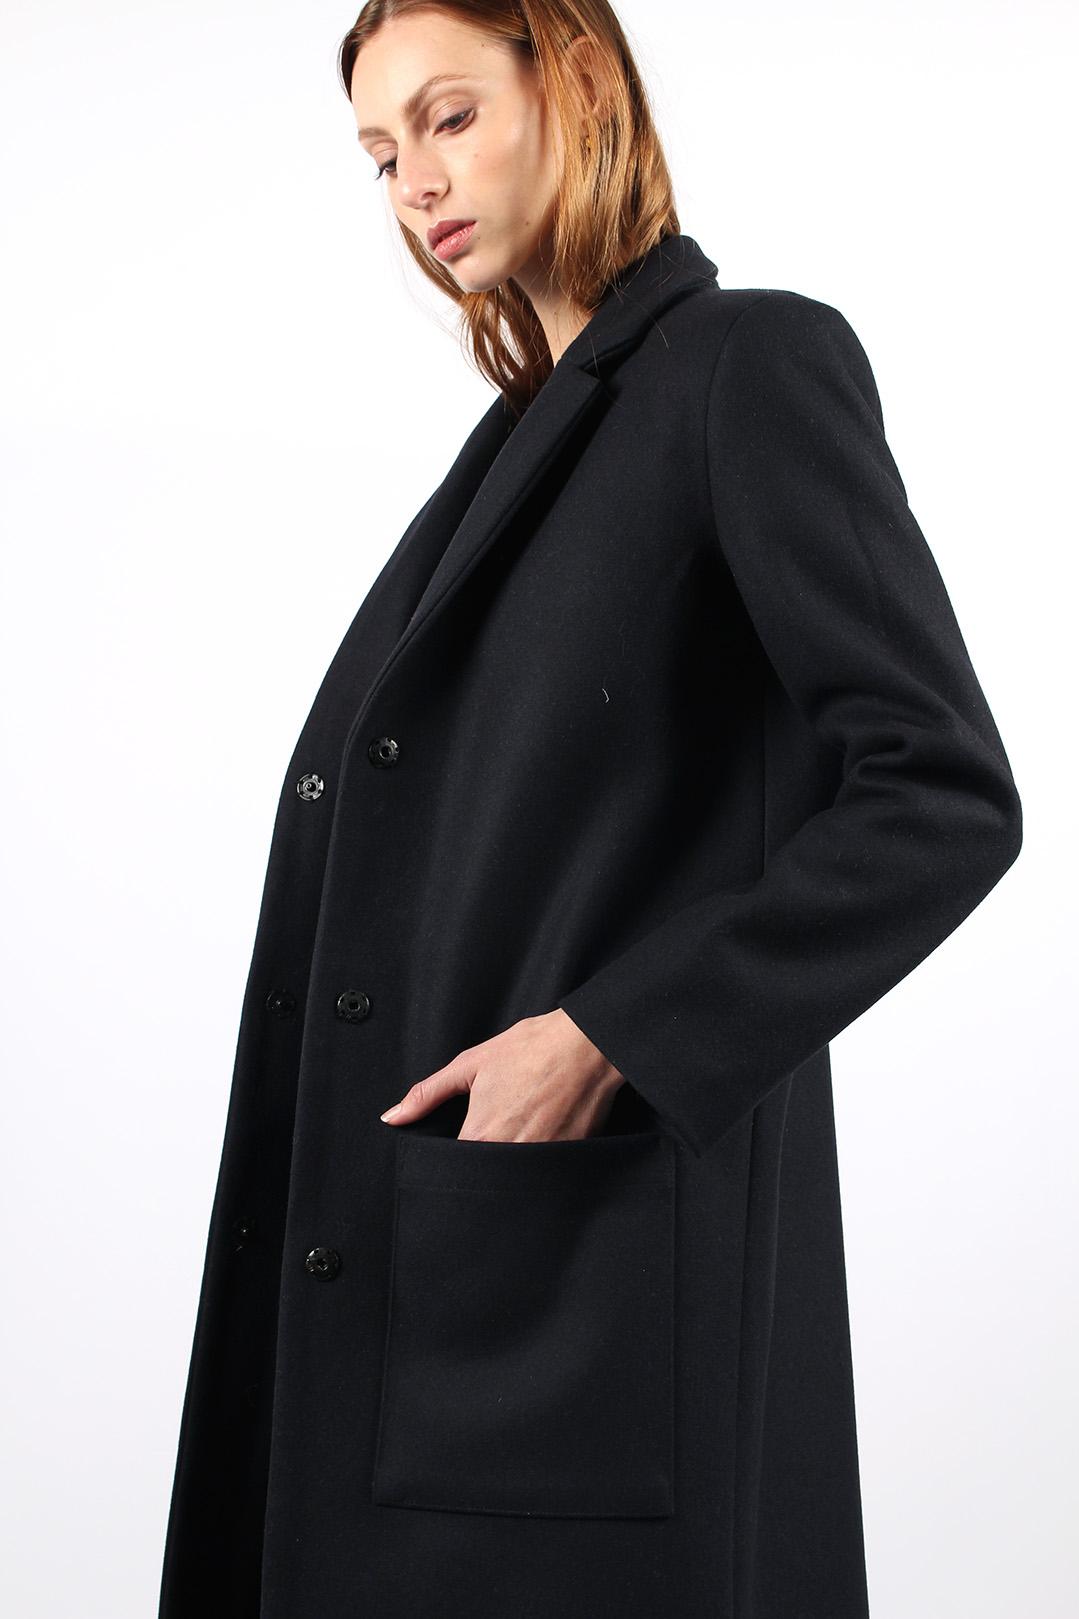 manteau droit femme bleu marine9